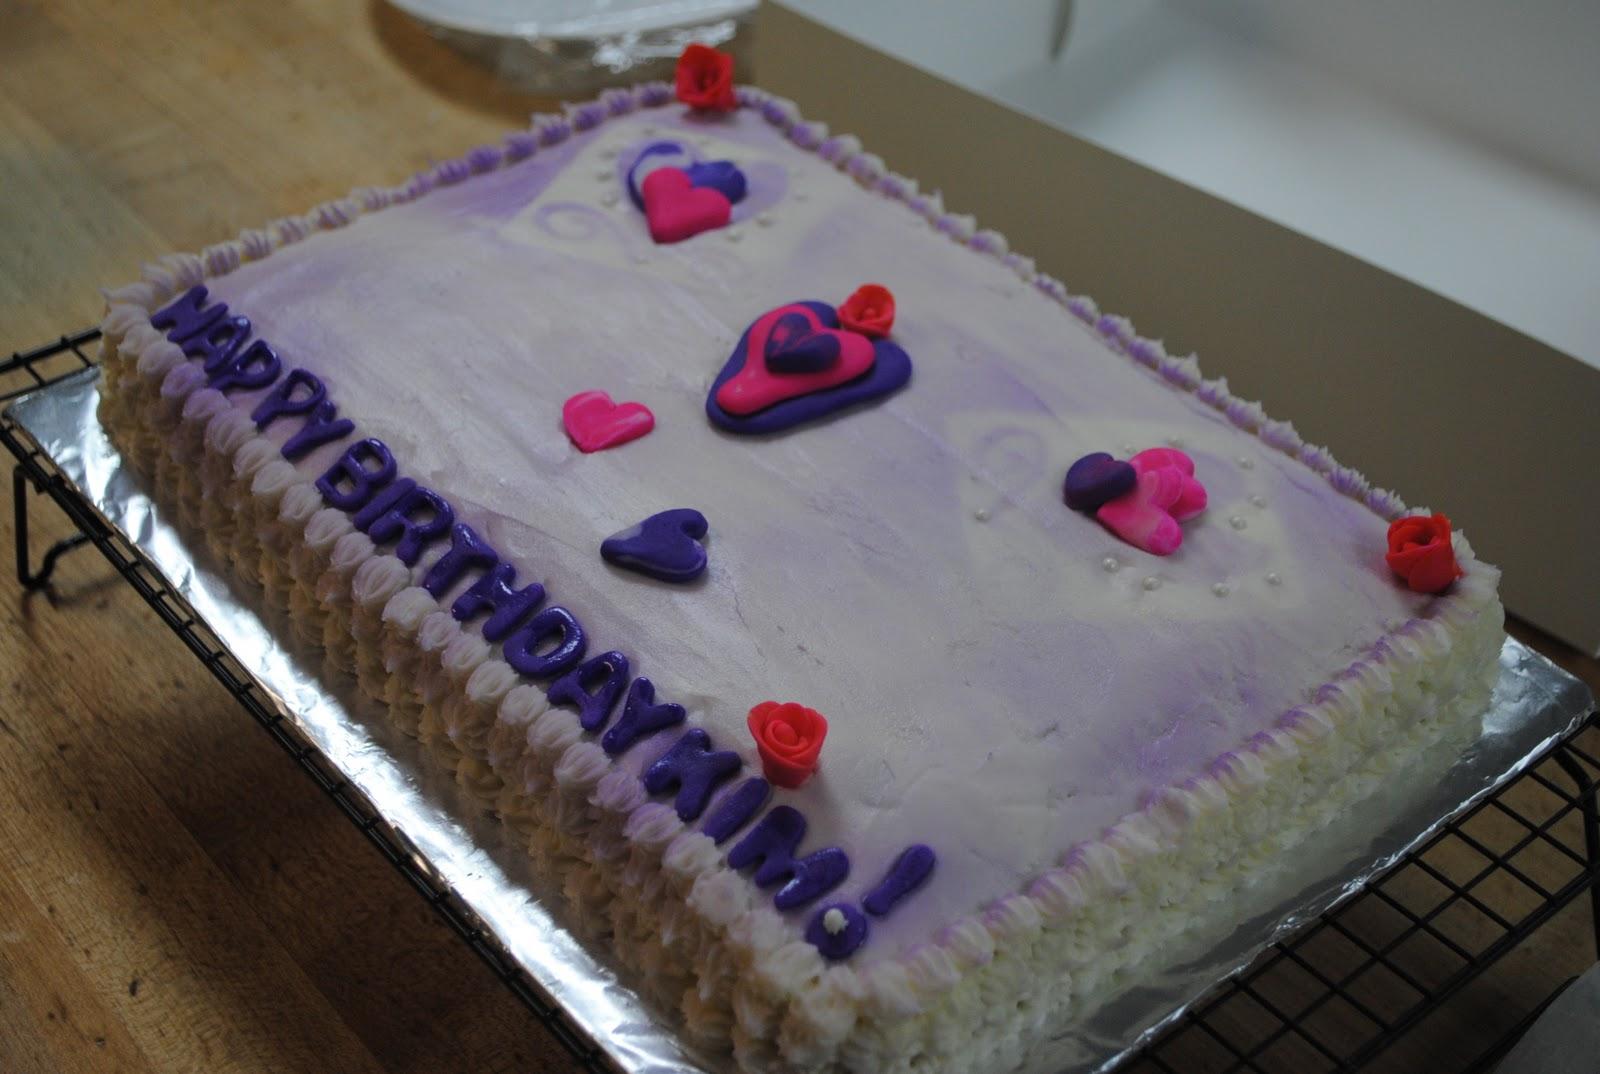 Cakes By Liz Poston The Happy Birthday Kim Cake